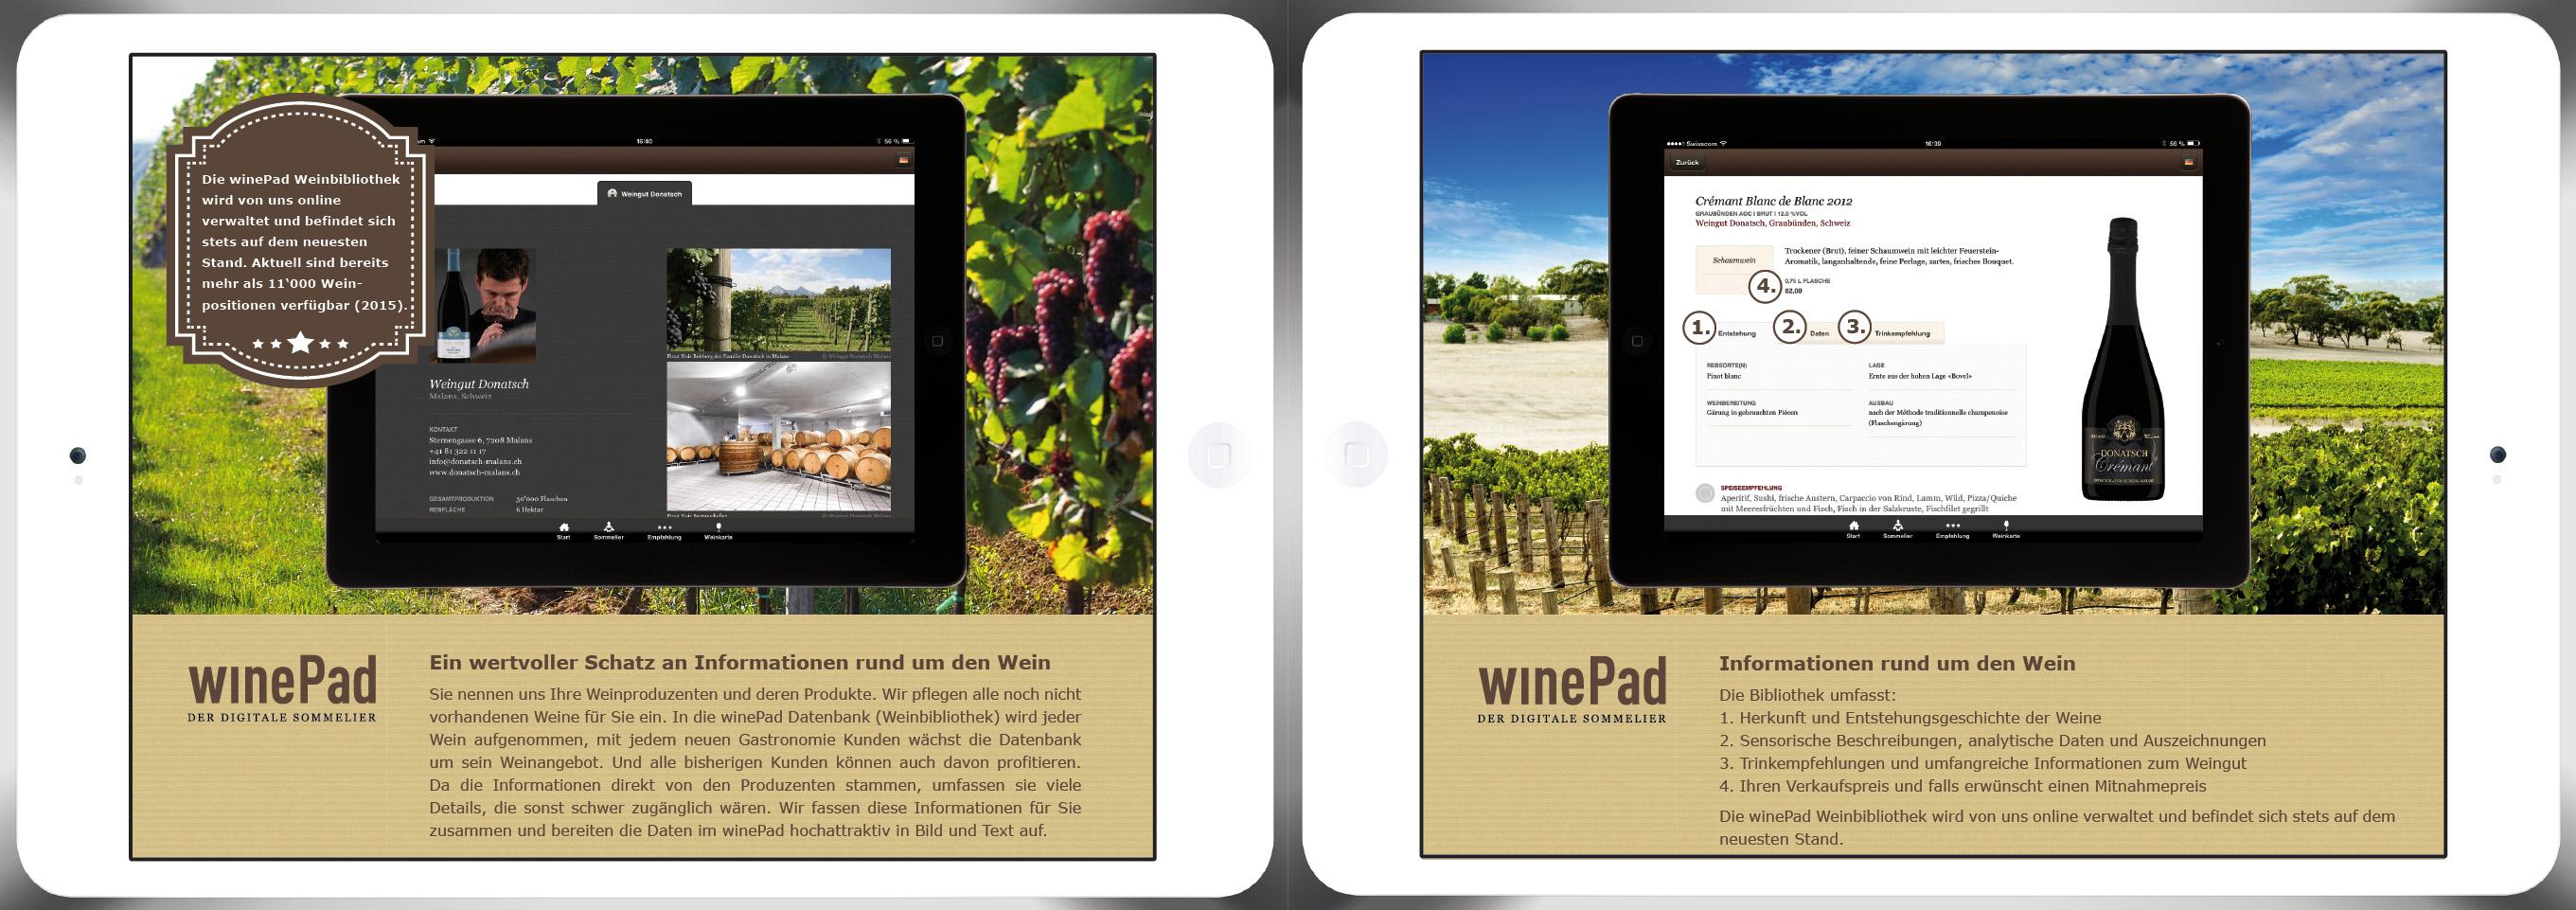 WinePad_iPad-Broschuere_Inhalt3